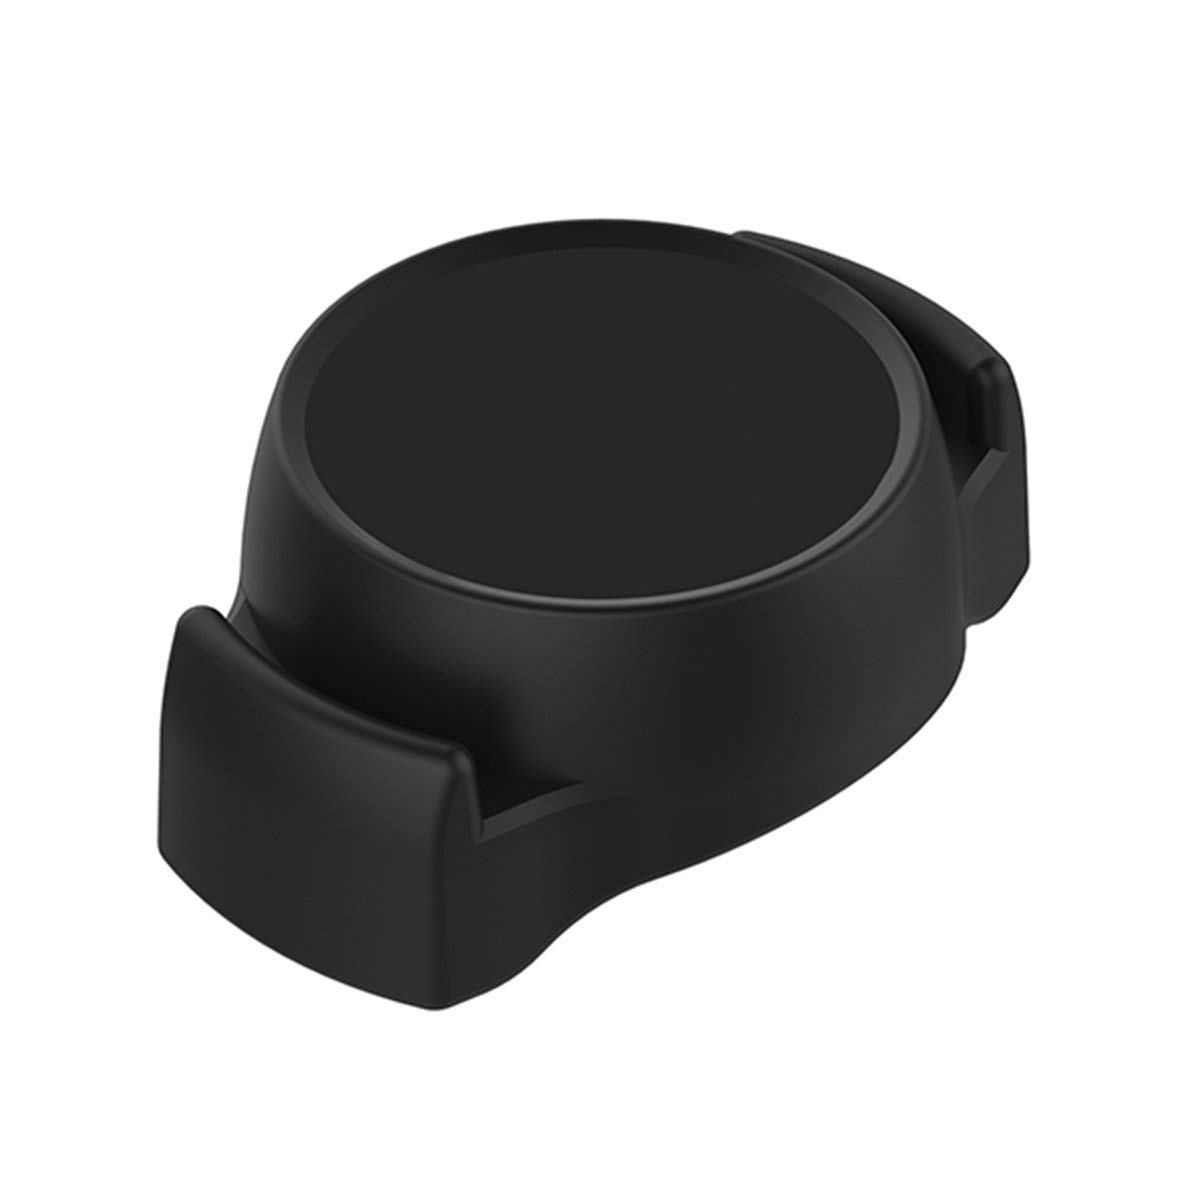 Crispsound Bike Speed Sensor & Cadence Sensor ANT+ Magnetless Waterproof Microminiature,IPX7 Ultra-Small Computer Speedometer